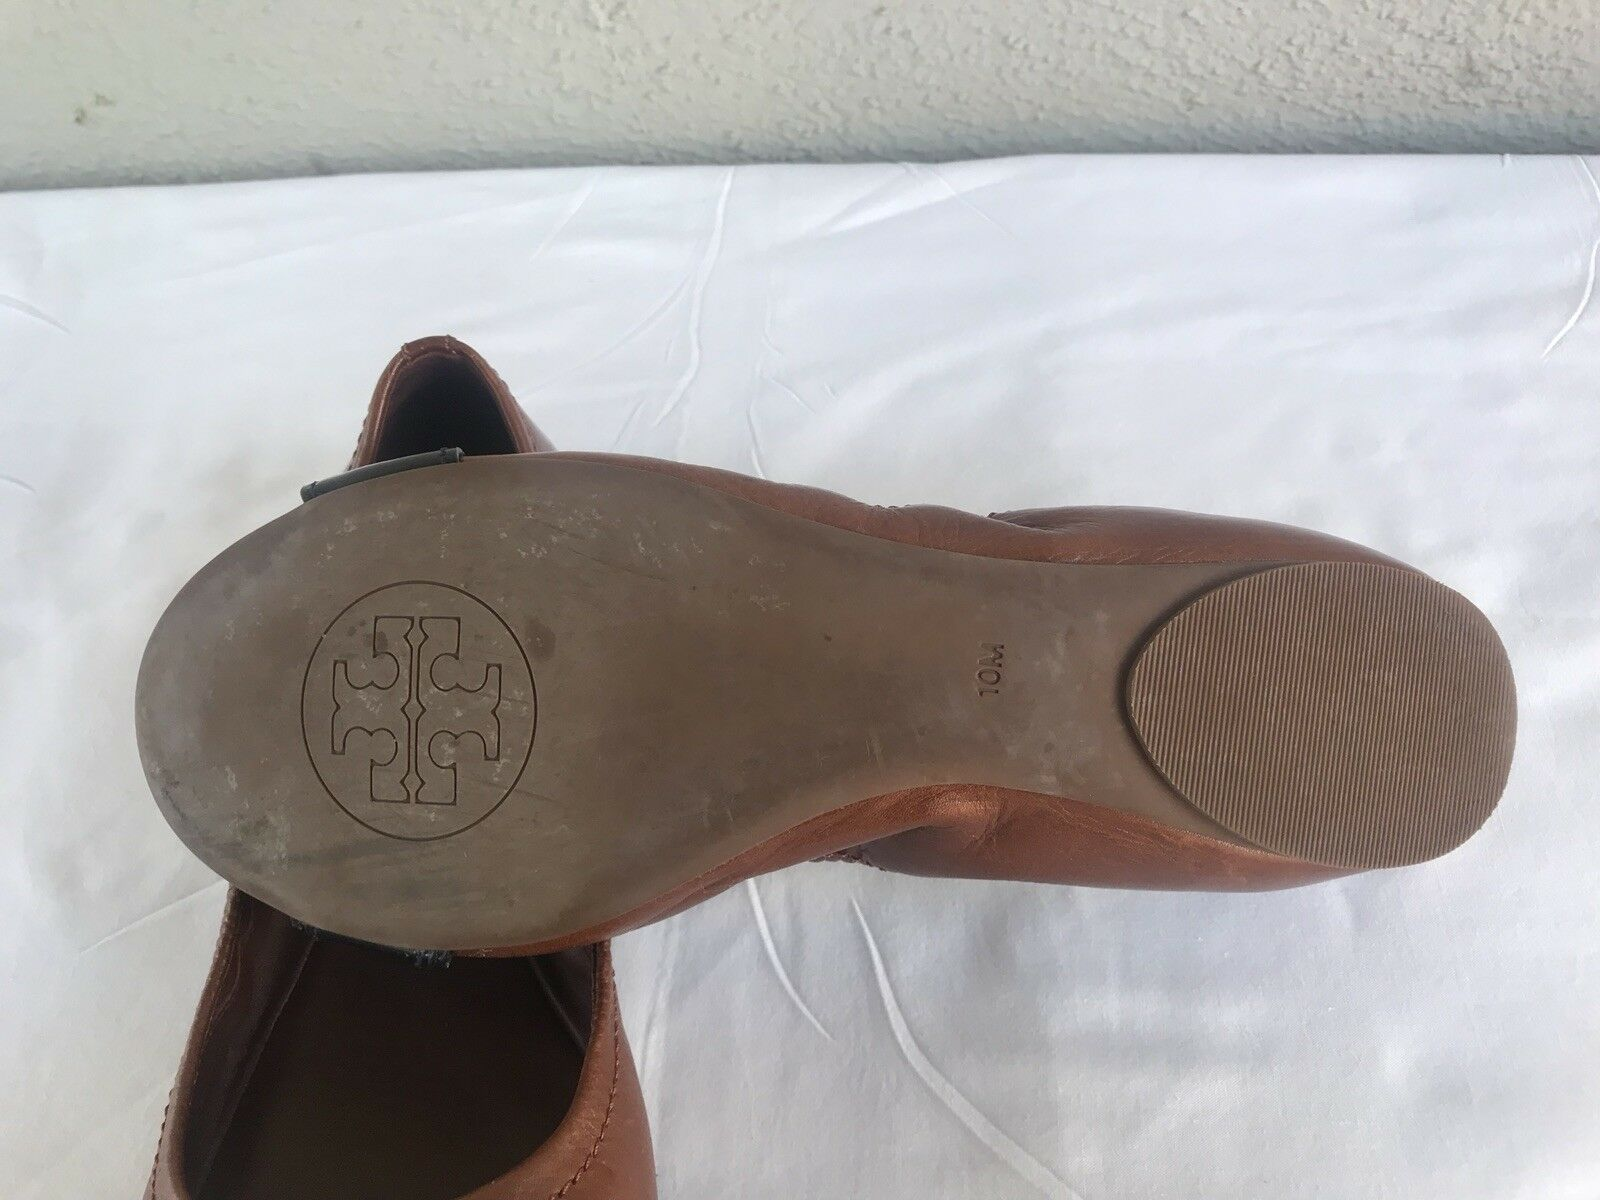 EUC! Tory Burch Noel US Size 10 Patent Ballet Ballerina Flat Brown Patent 10 Ballet Shoe B 77edc2